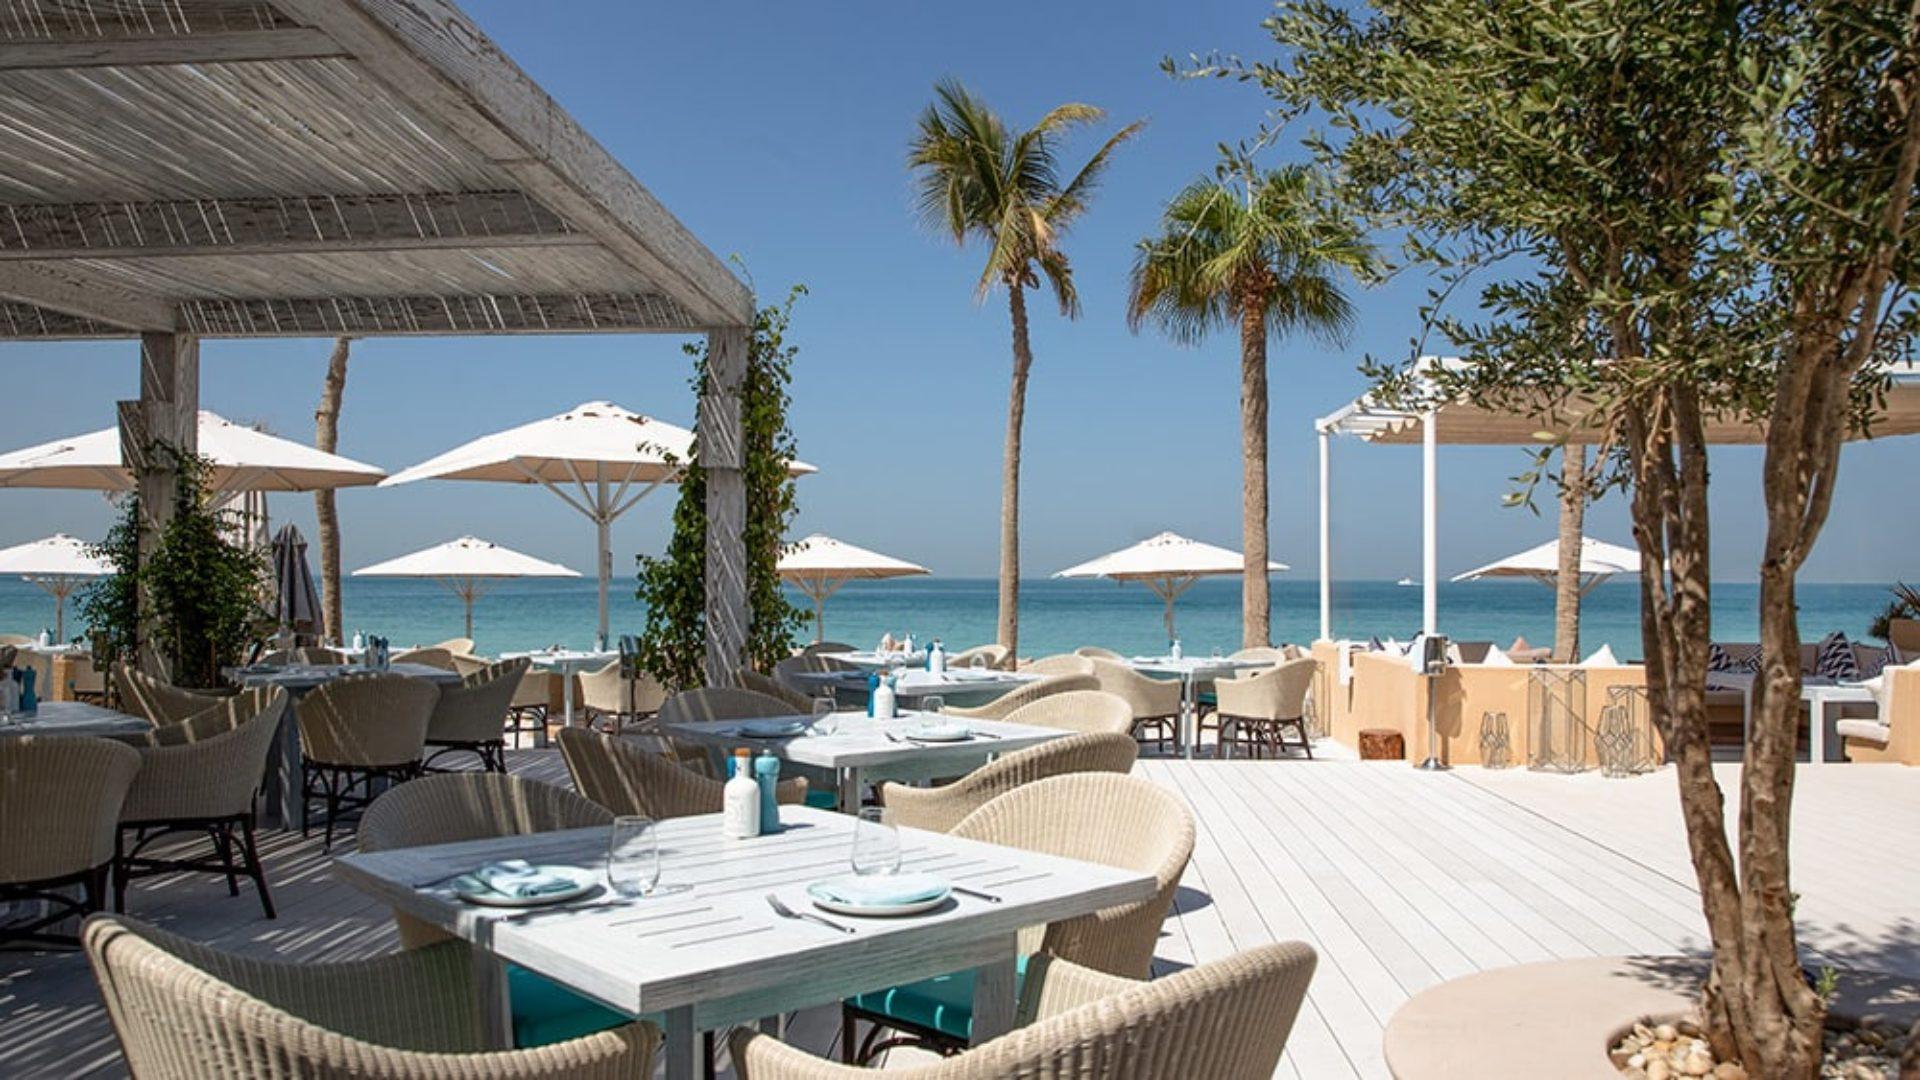 Outdoor terrace at Shimmers Restaurant at Jumeirah Mina A'Salam